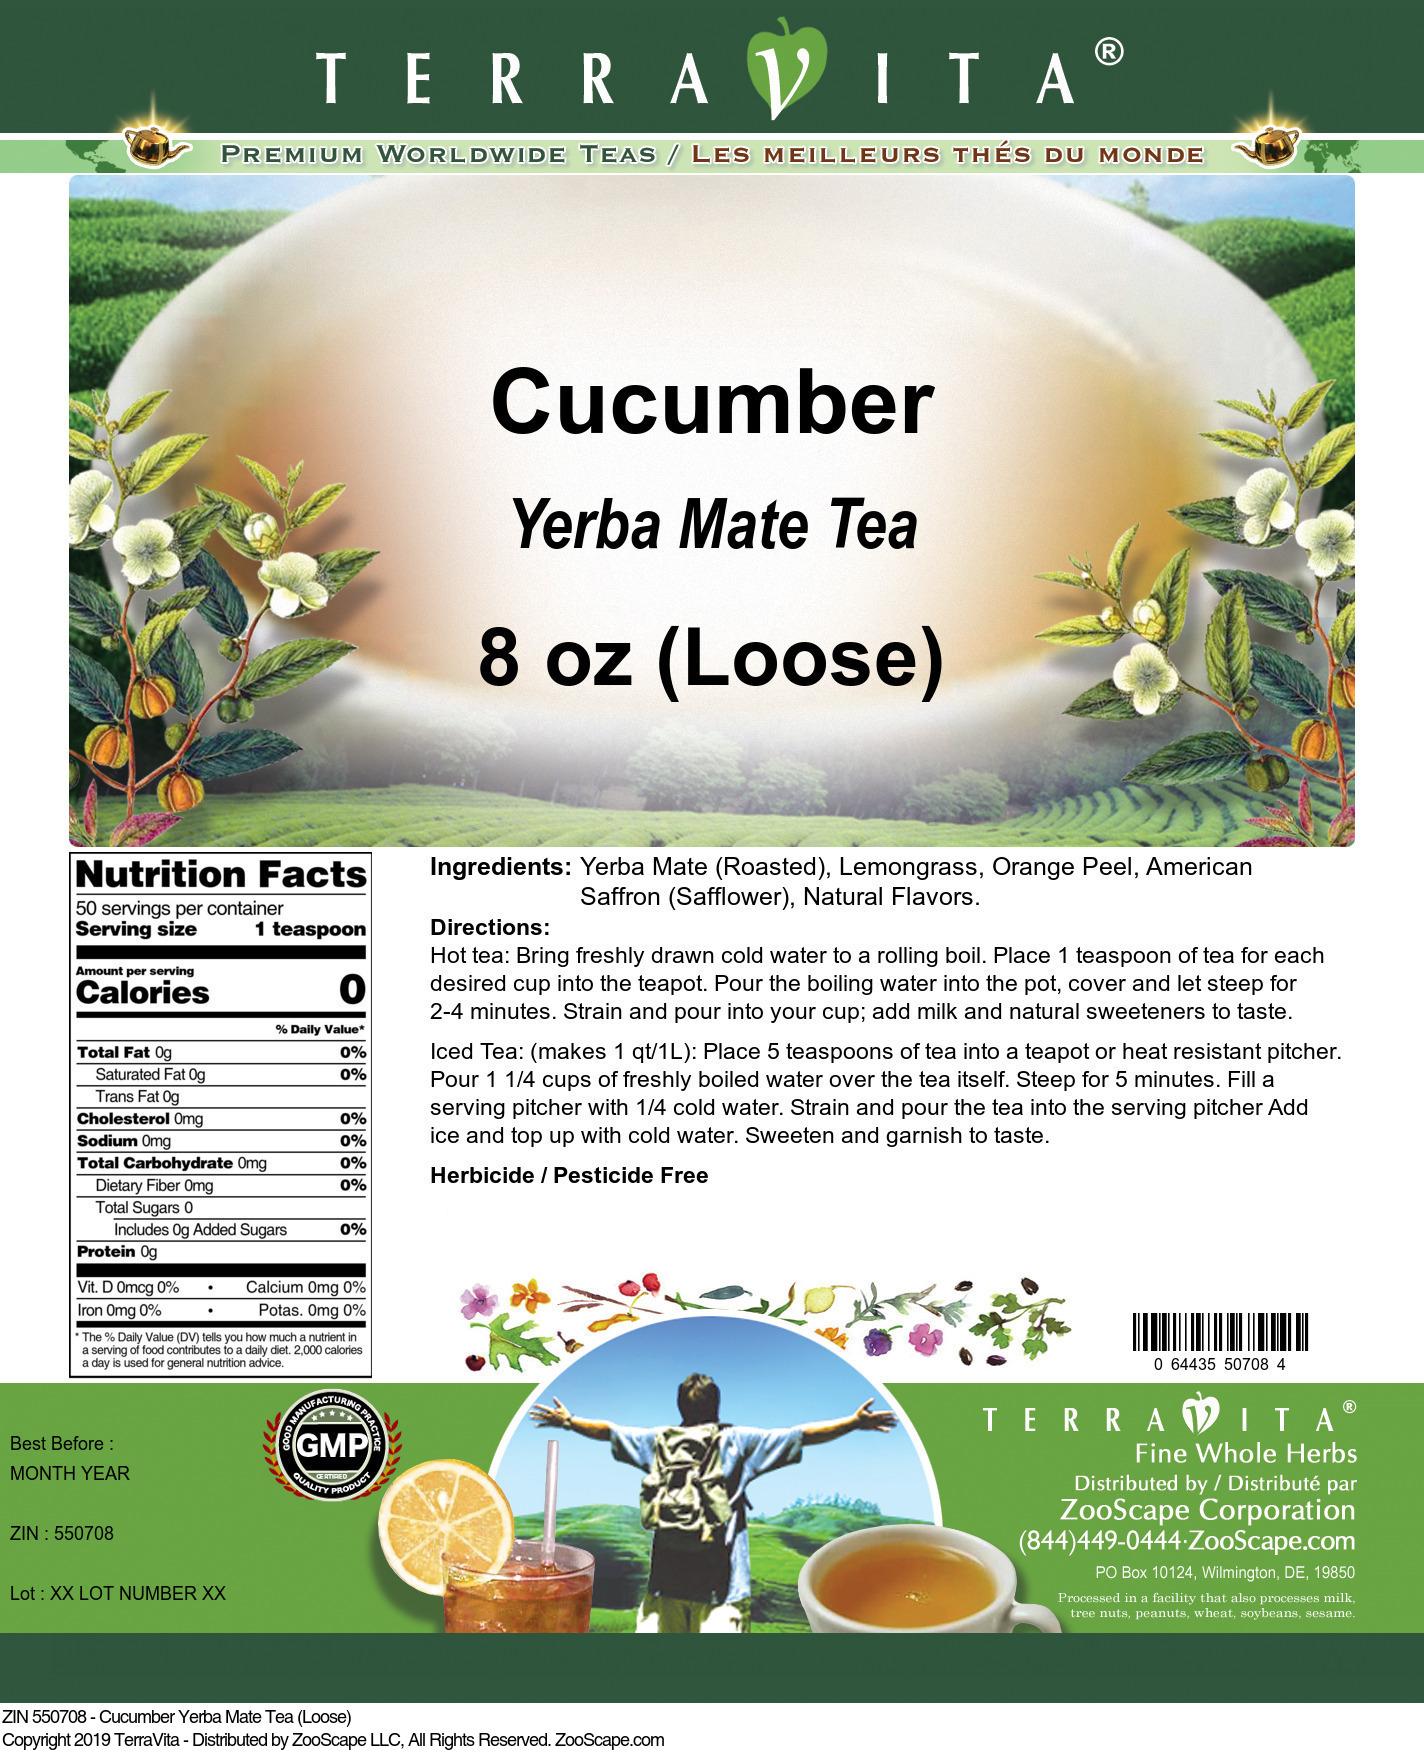 Cucumber Yerba Mate